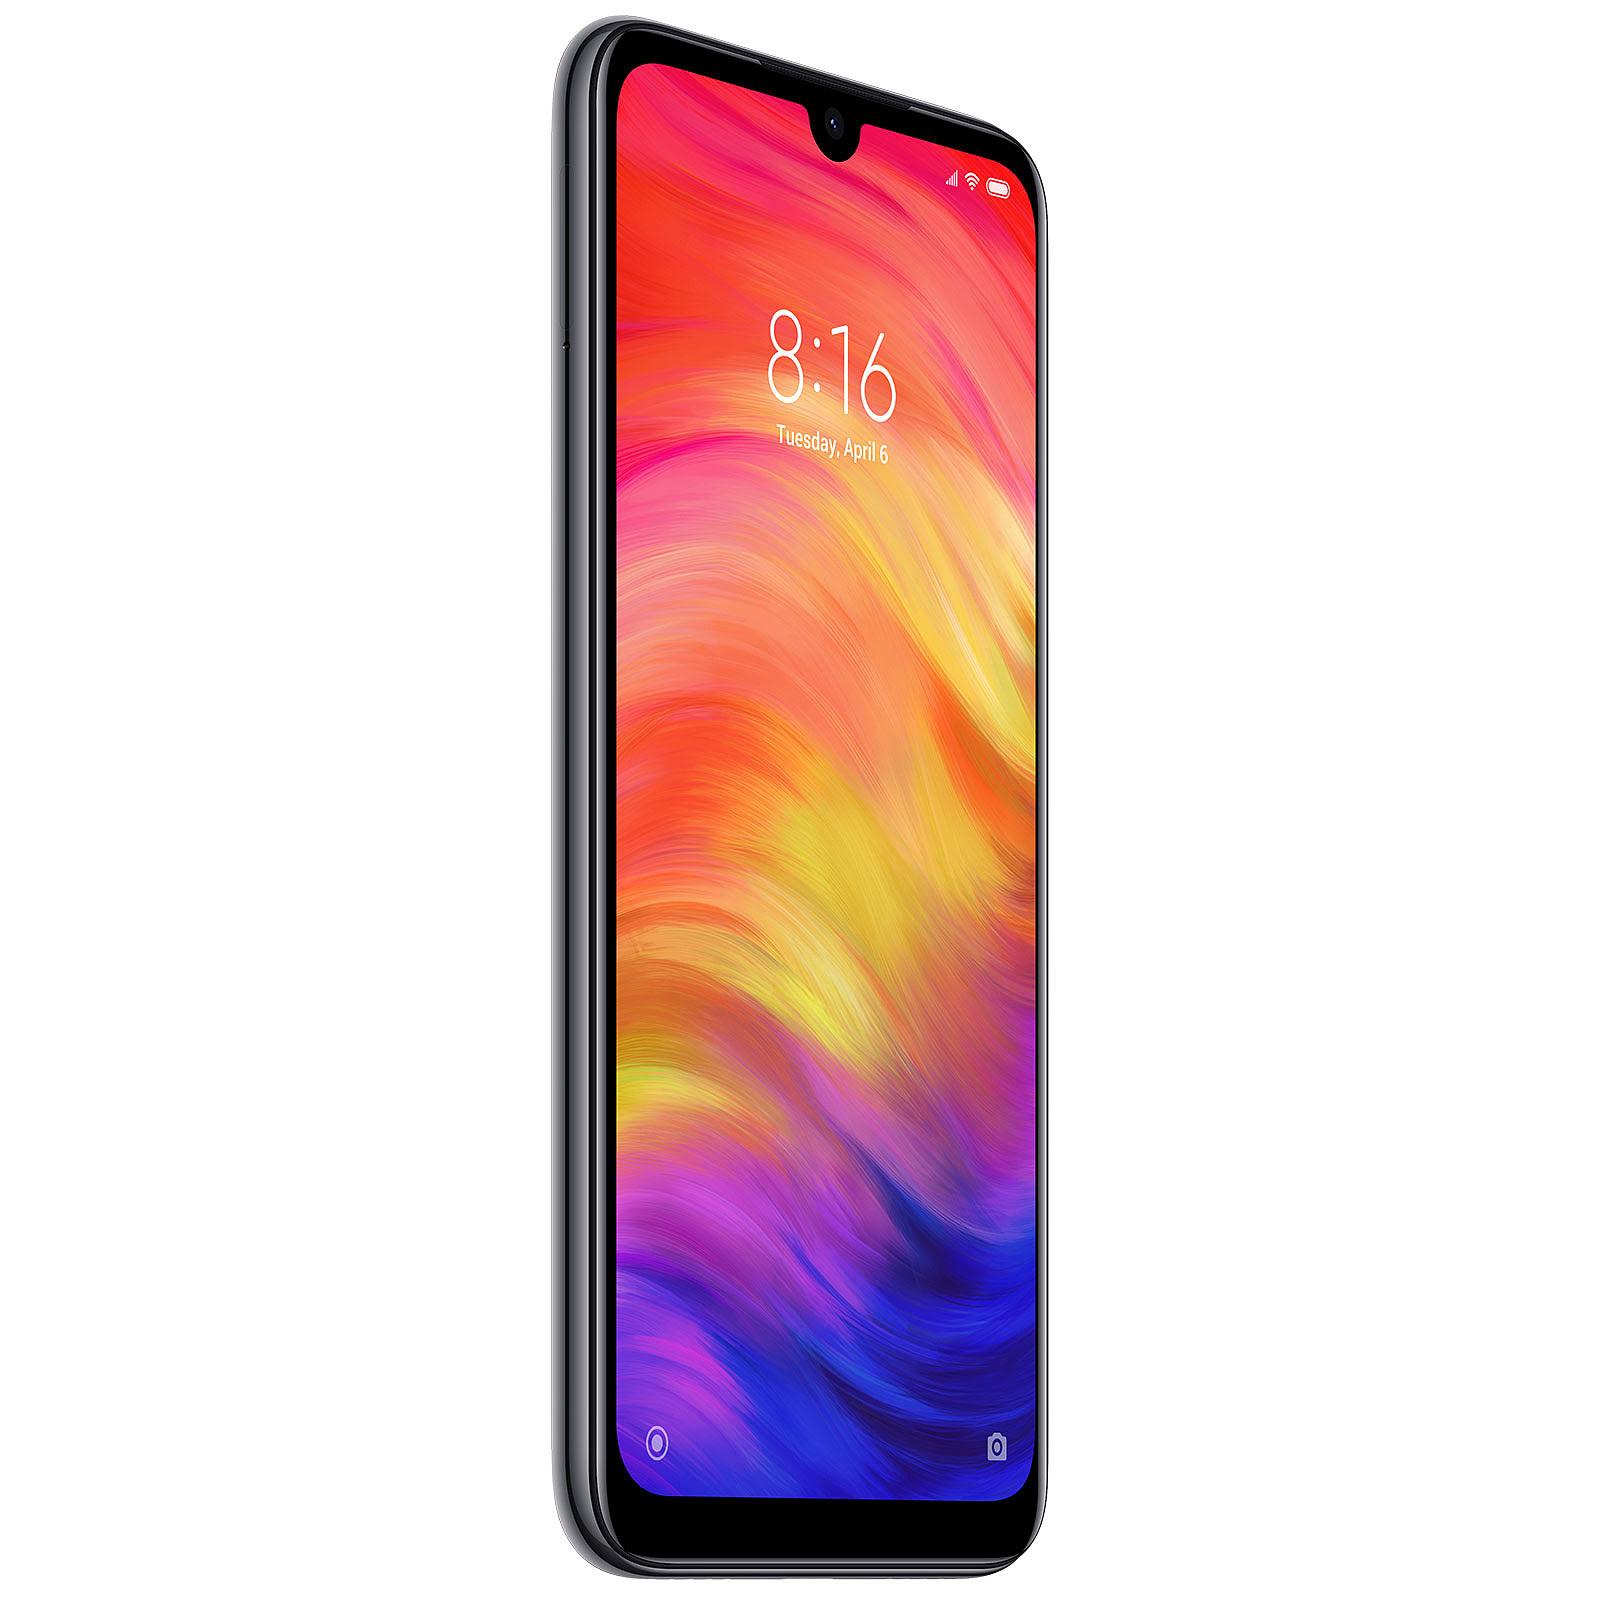 Xiaomi Redmi Note 7 4Go 64Go Noir - Téléphonie Xiaomi - 2